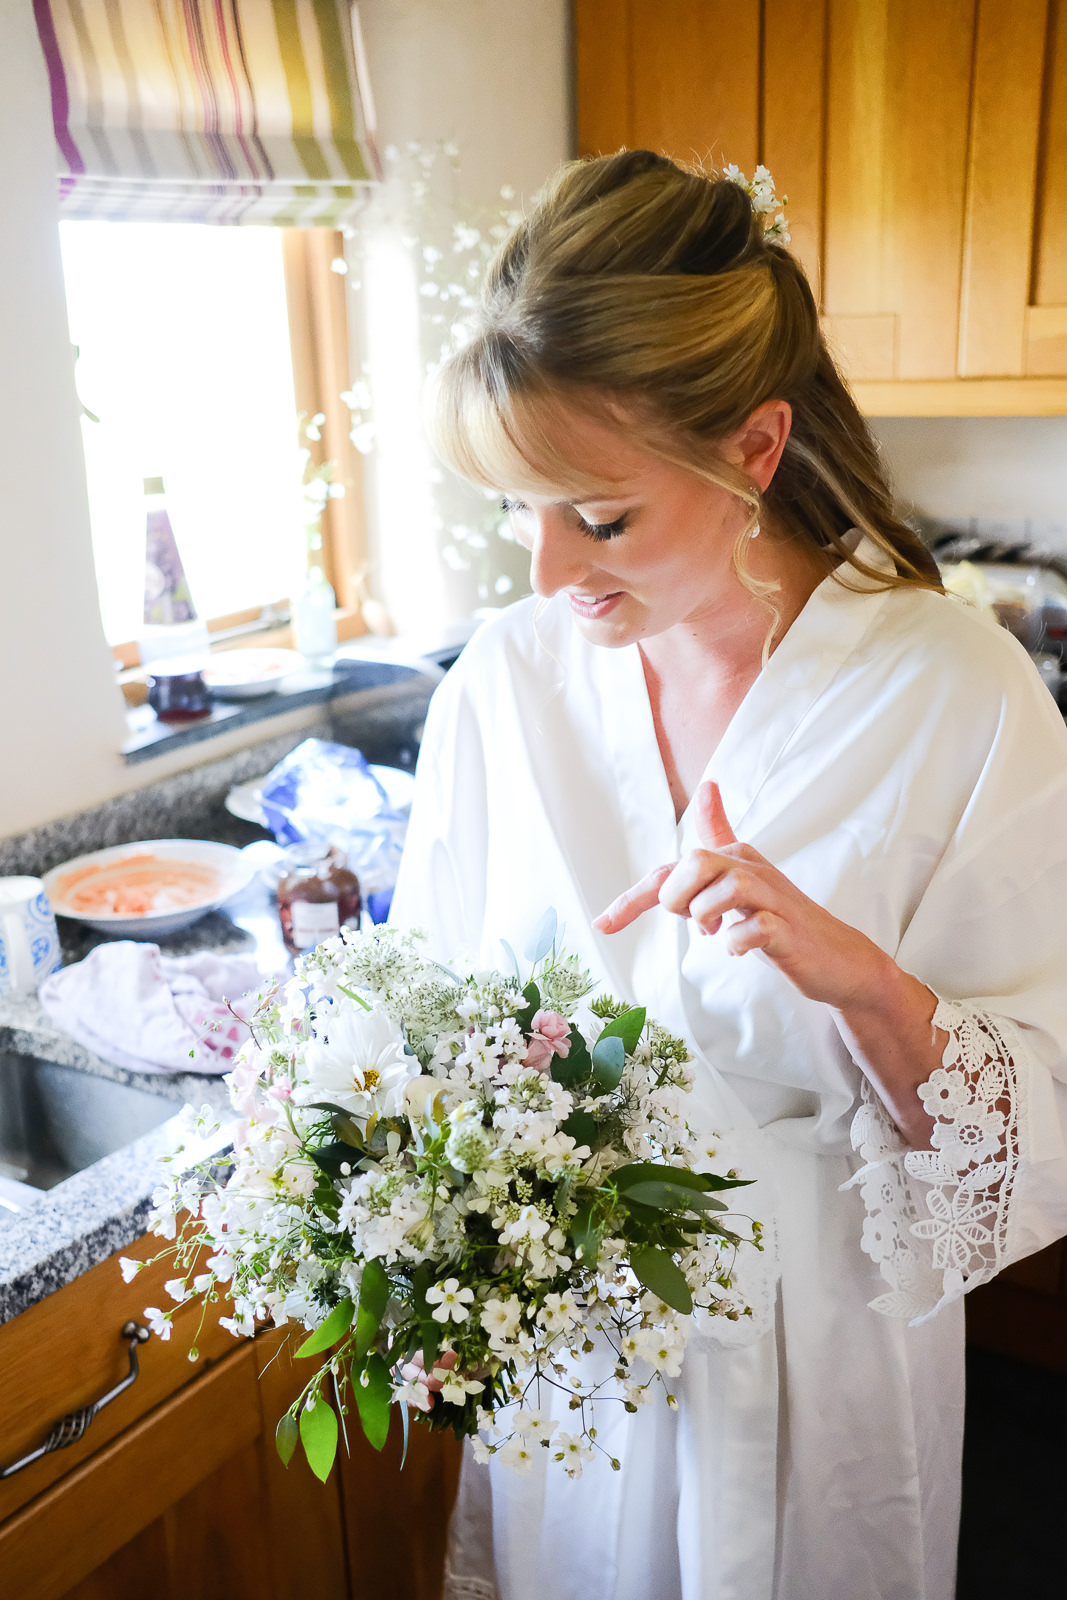 Roscarrock Farm wedding in Cornwall 018.jpg